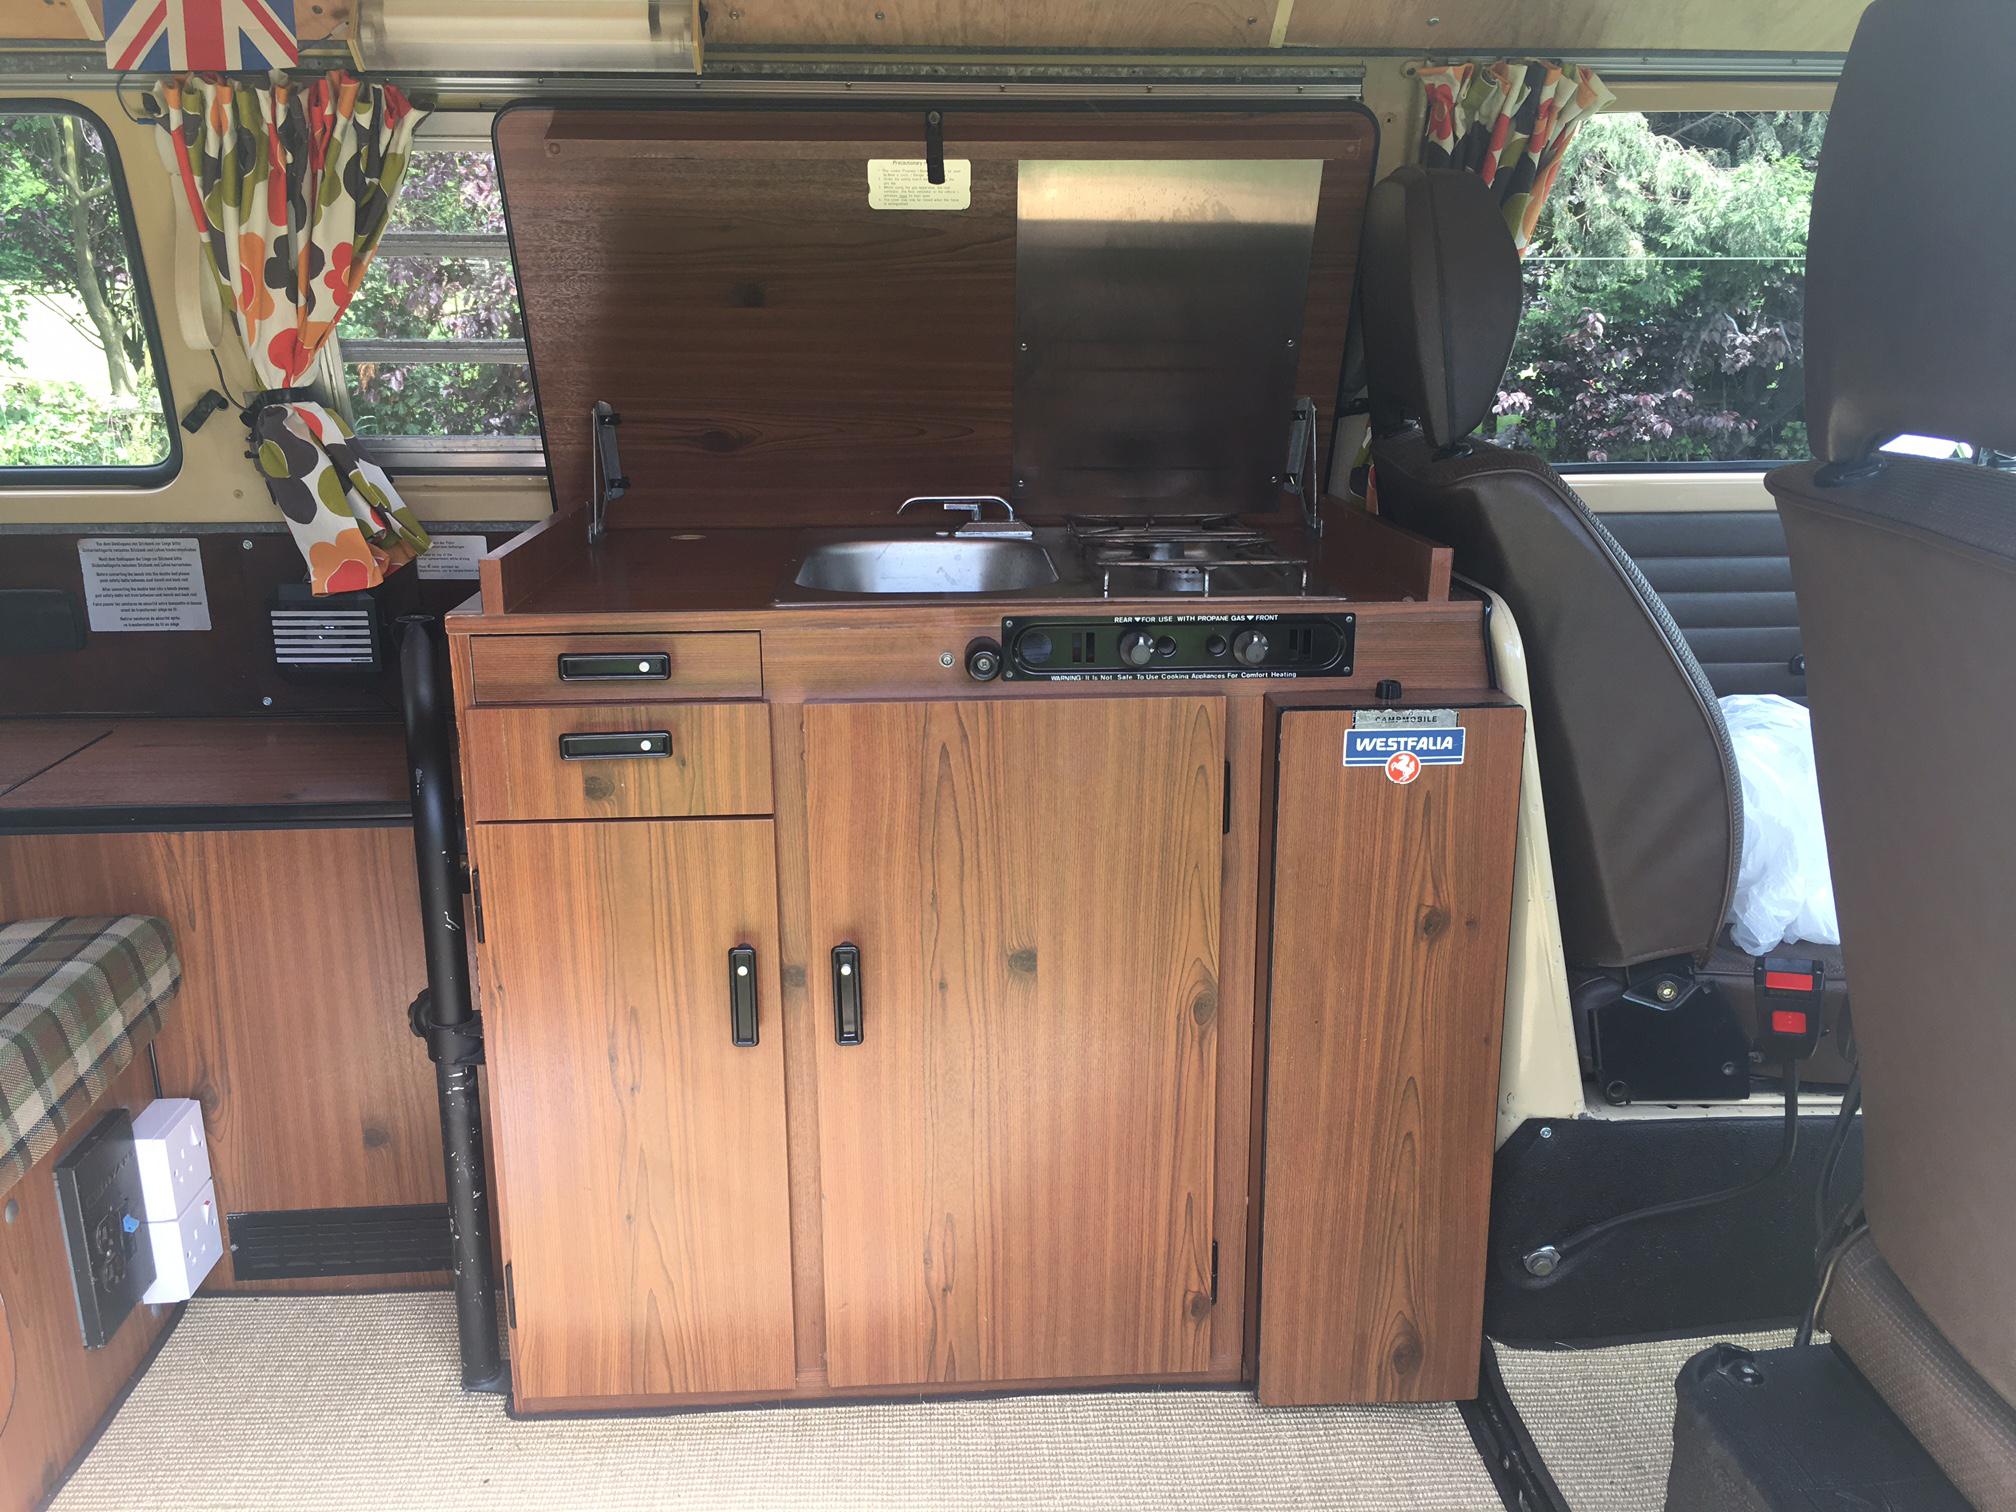 1978-Westfalia-Camper-Van-Interior